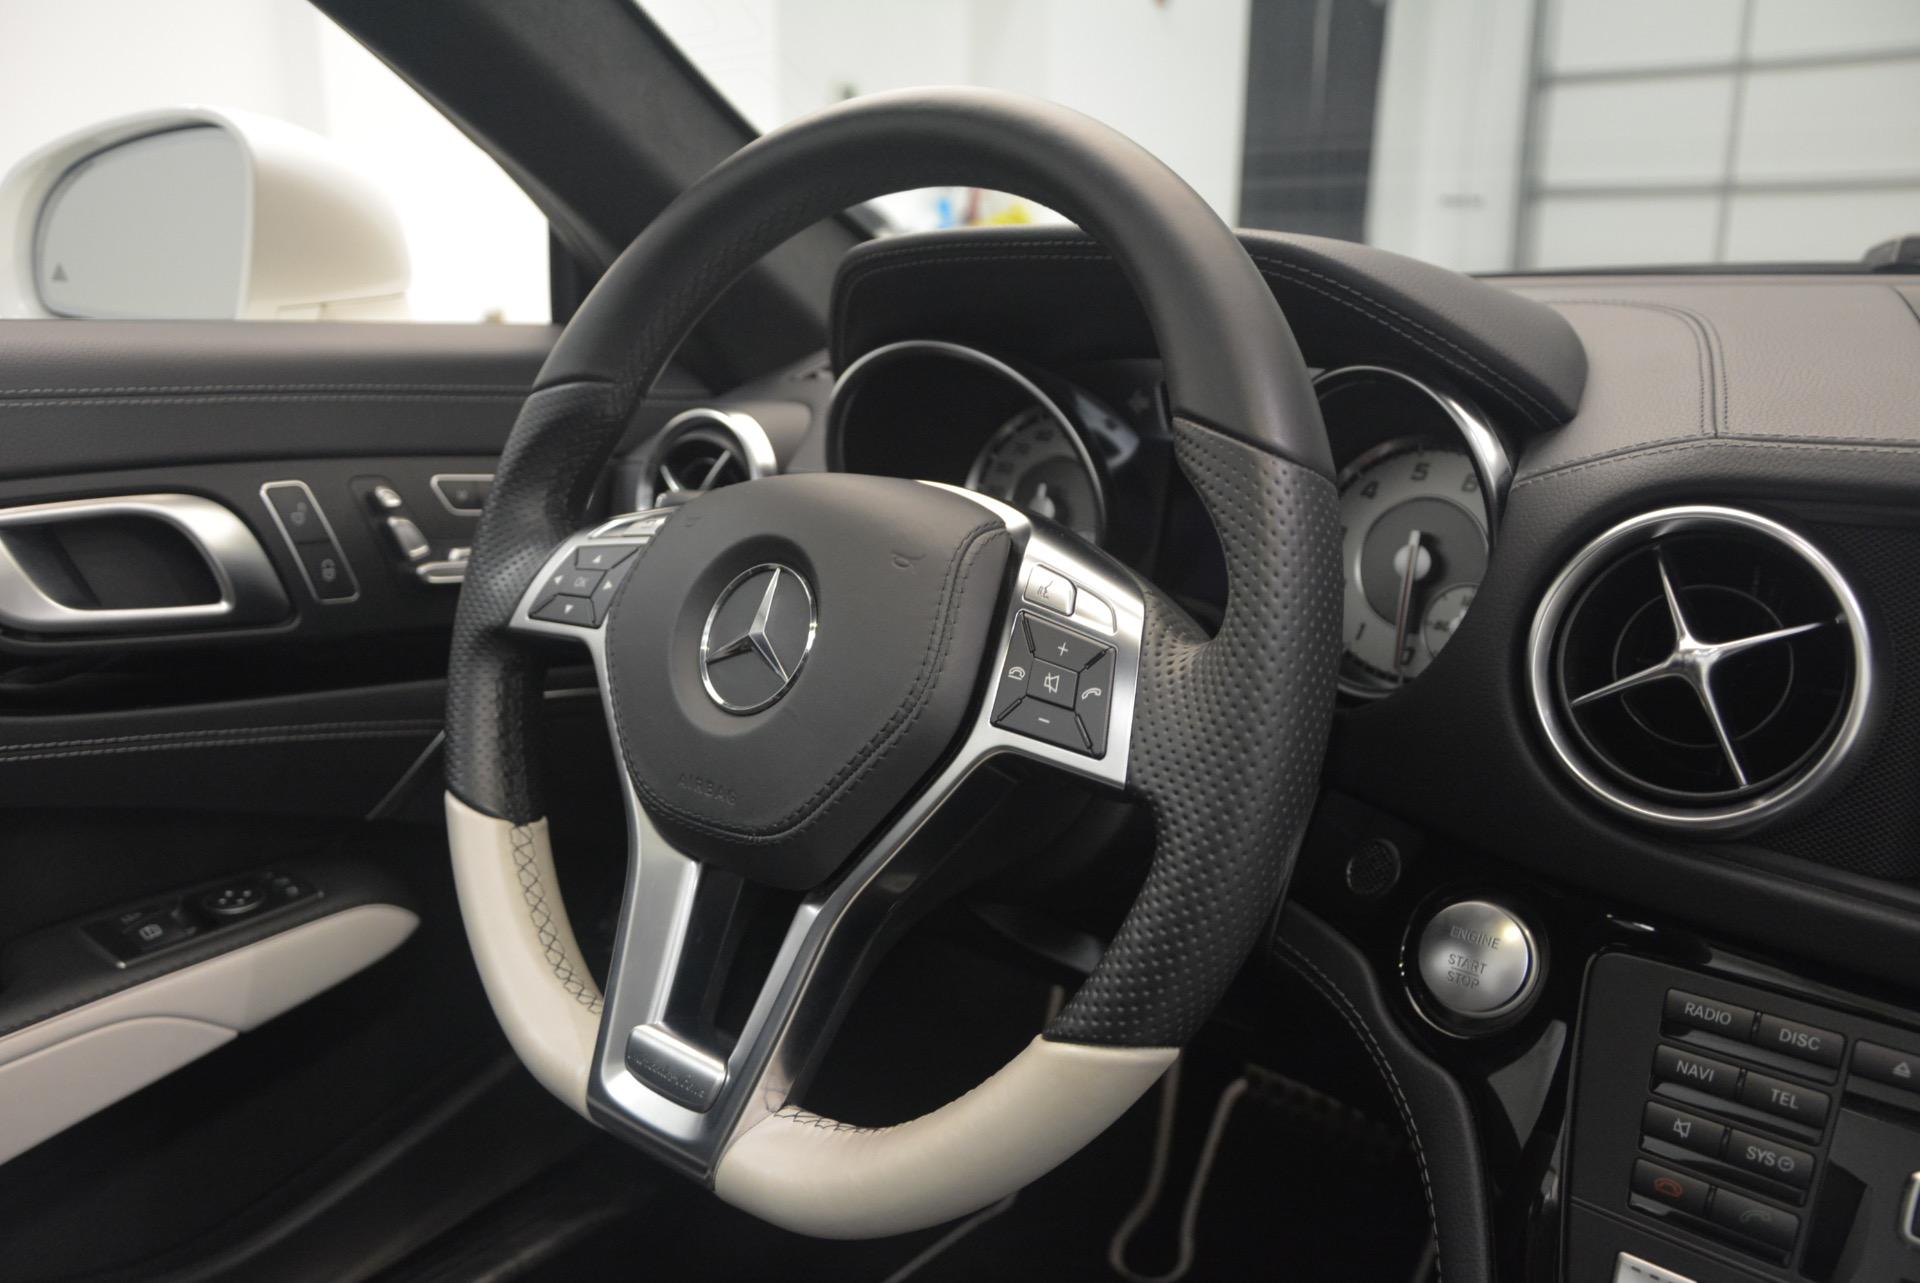 Used 2015 Mercedes Benz SL-Class SL 550 For Sale In Greenwich, CT. Alfa Romeo of Greenwich, M1874A 1261_p47